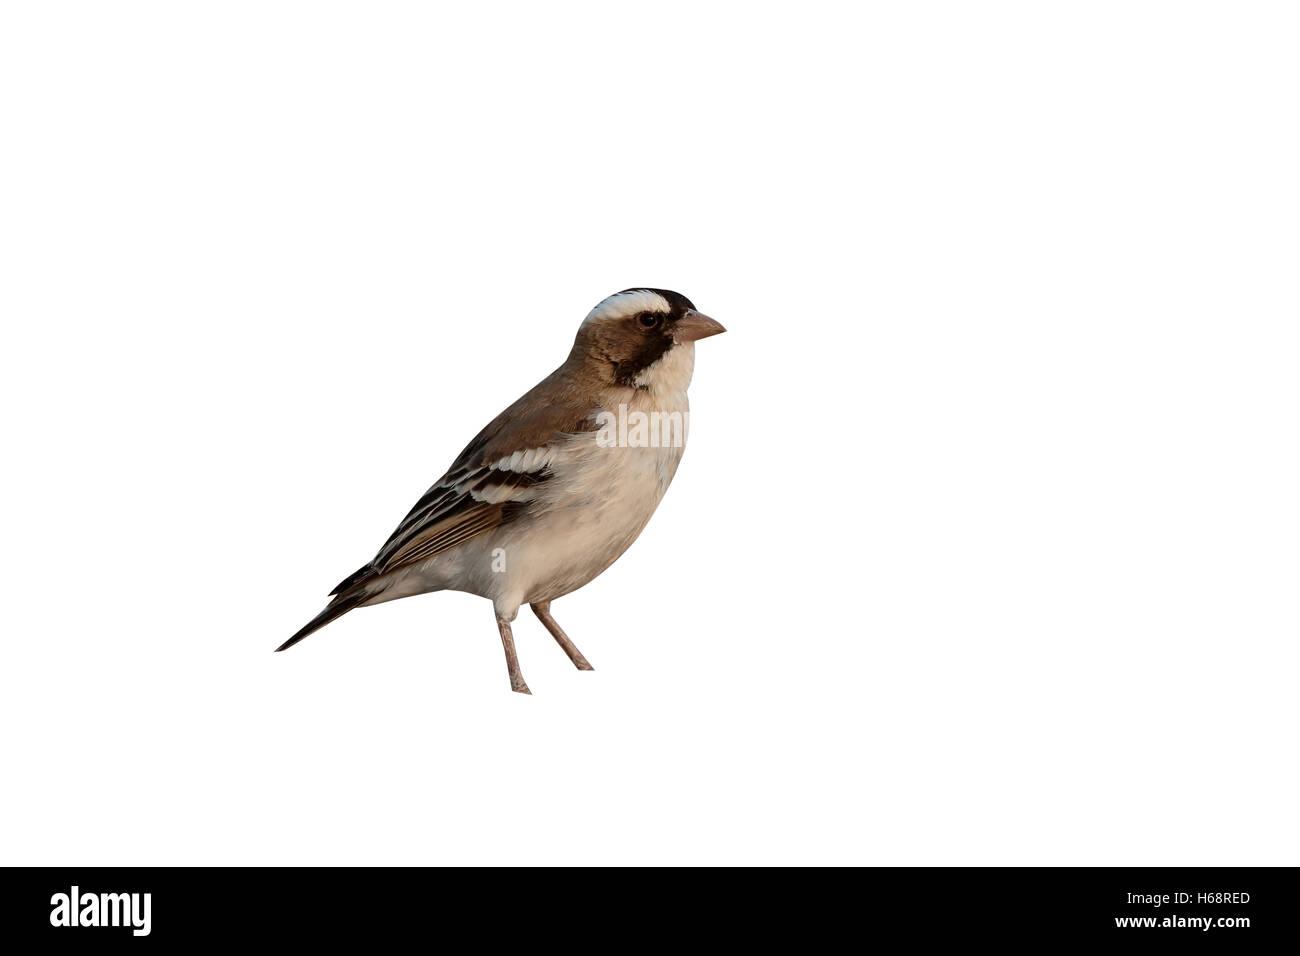 White-browed sparrow-weaver,  Plocepasser mahali, single bird on floor, South Africa, August 2016 - Stock Image